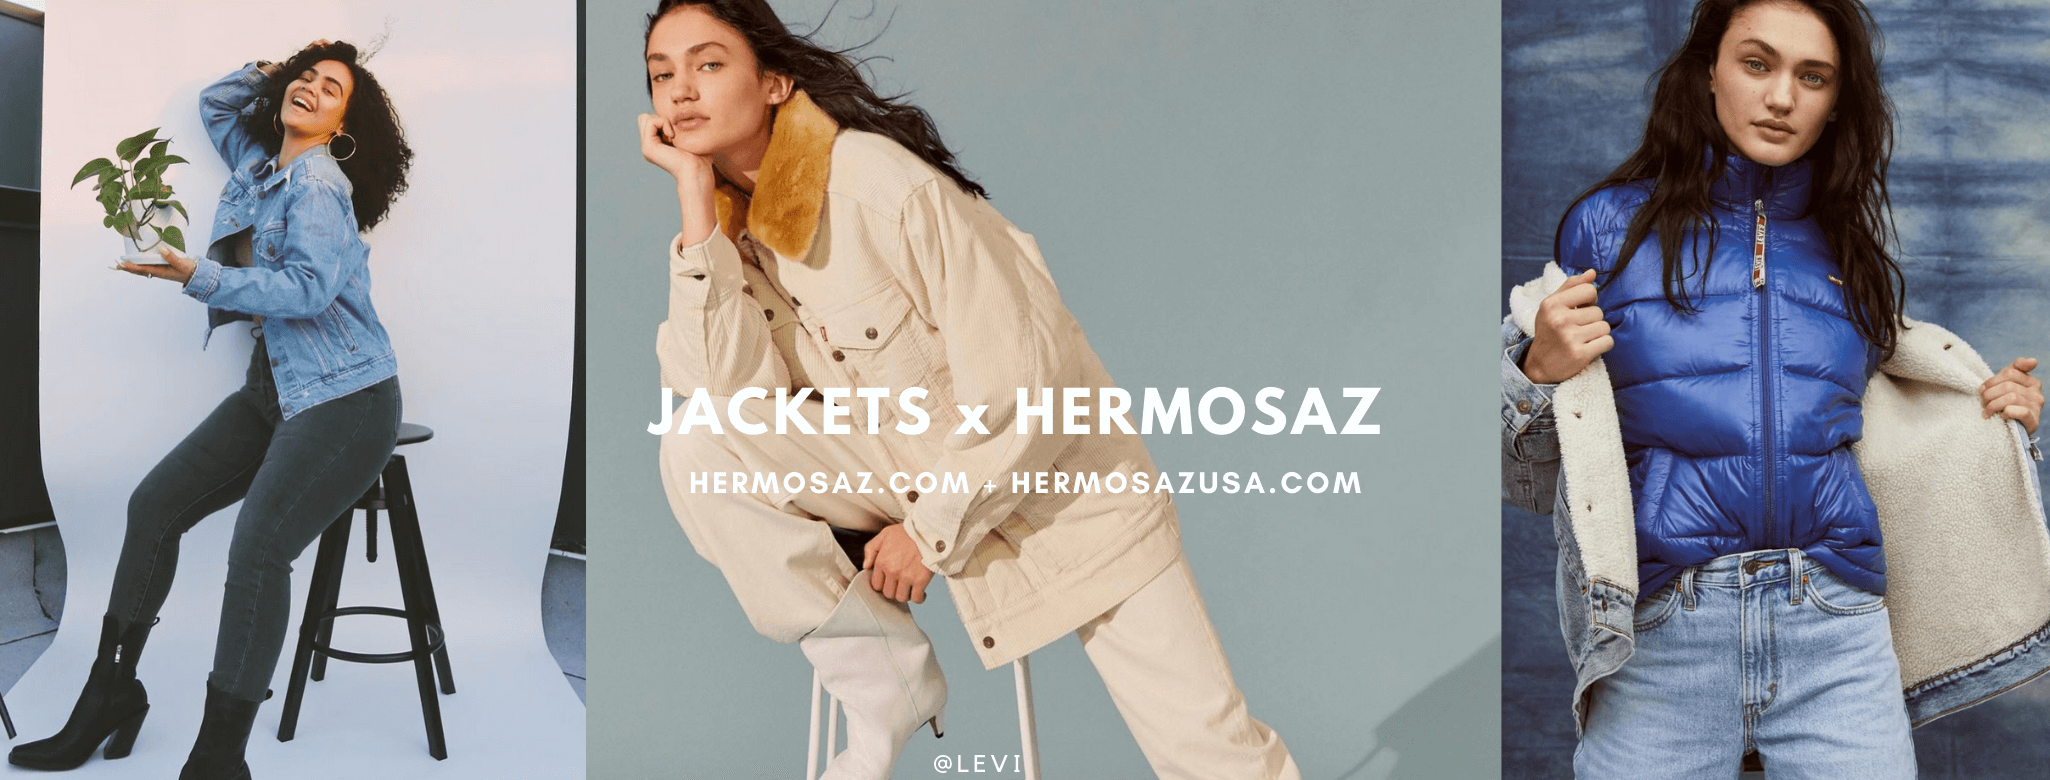 Jackets x Hermosaz